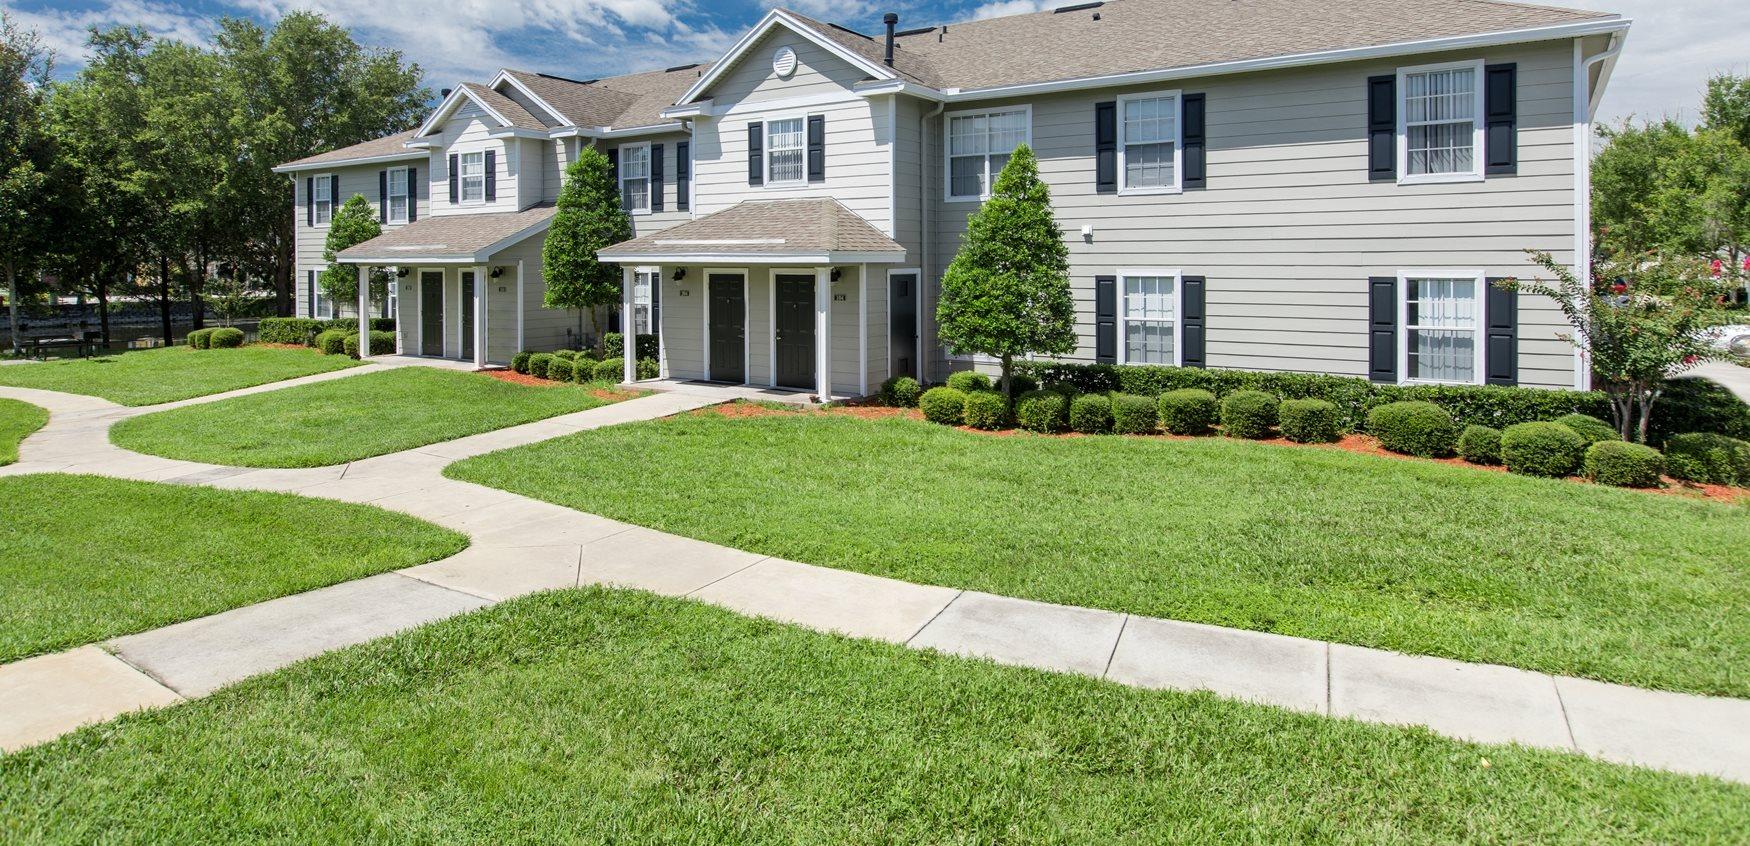 Concord Rents Concord Management Rental Apartments Property Management